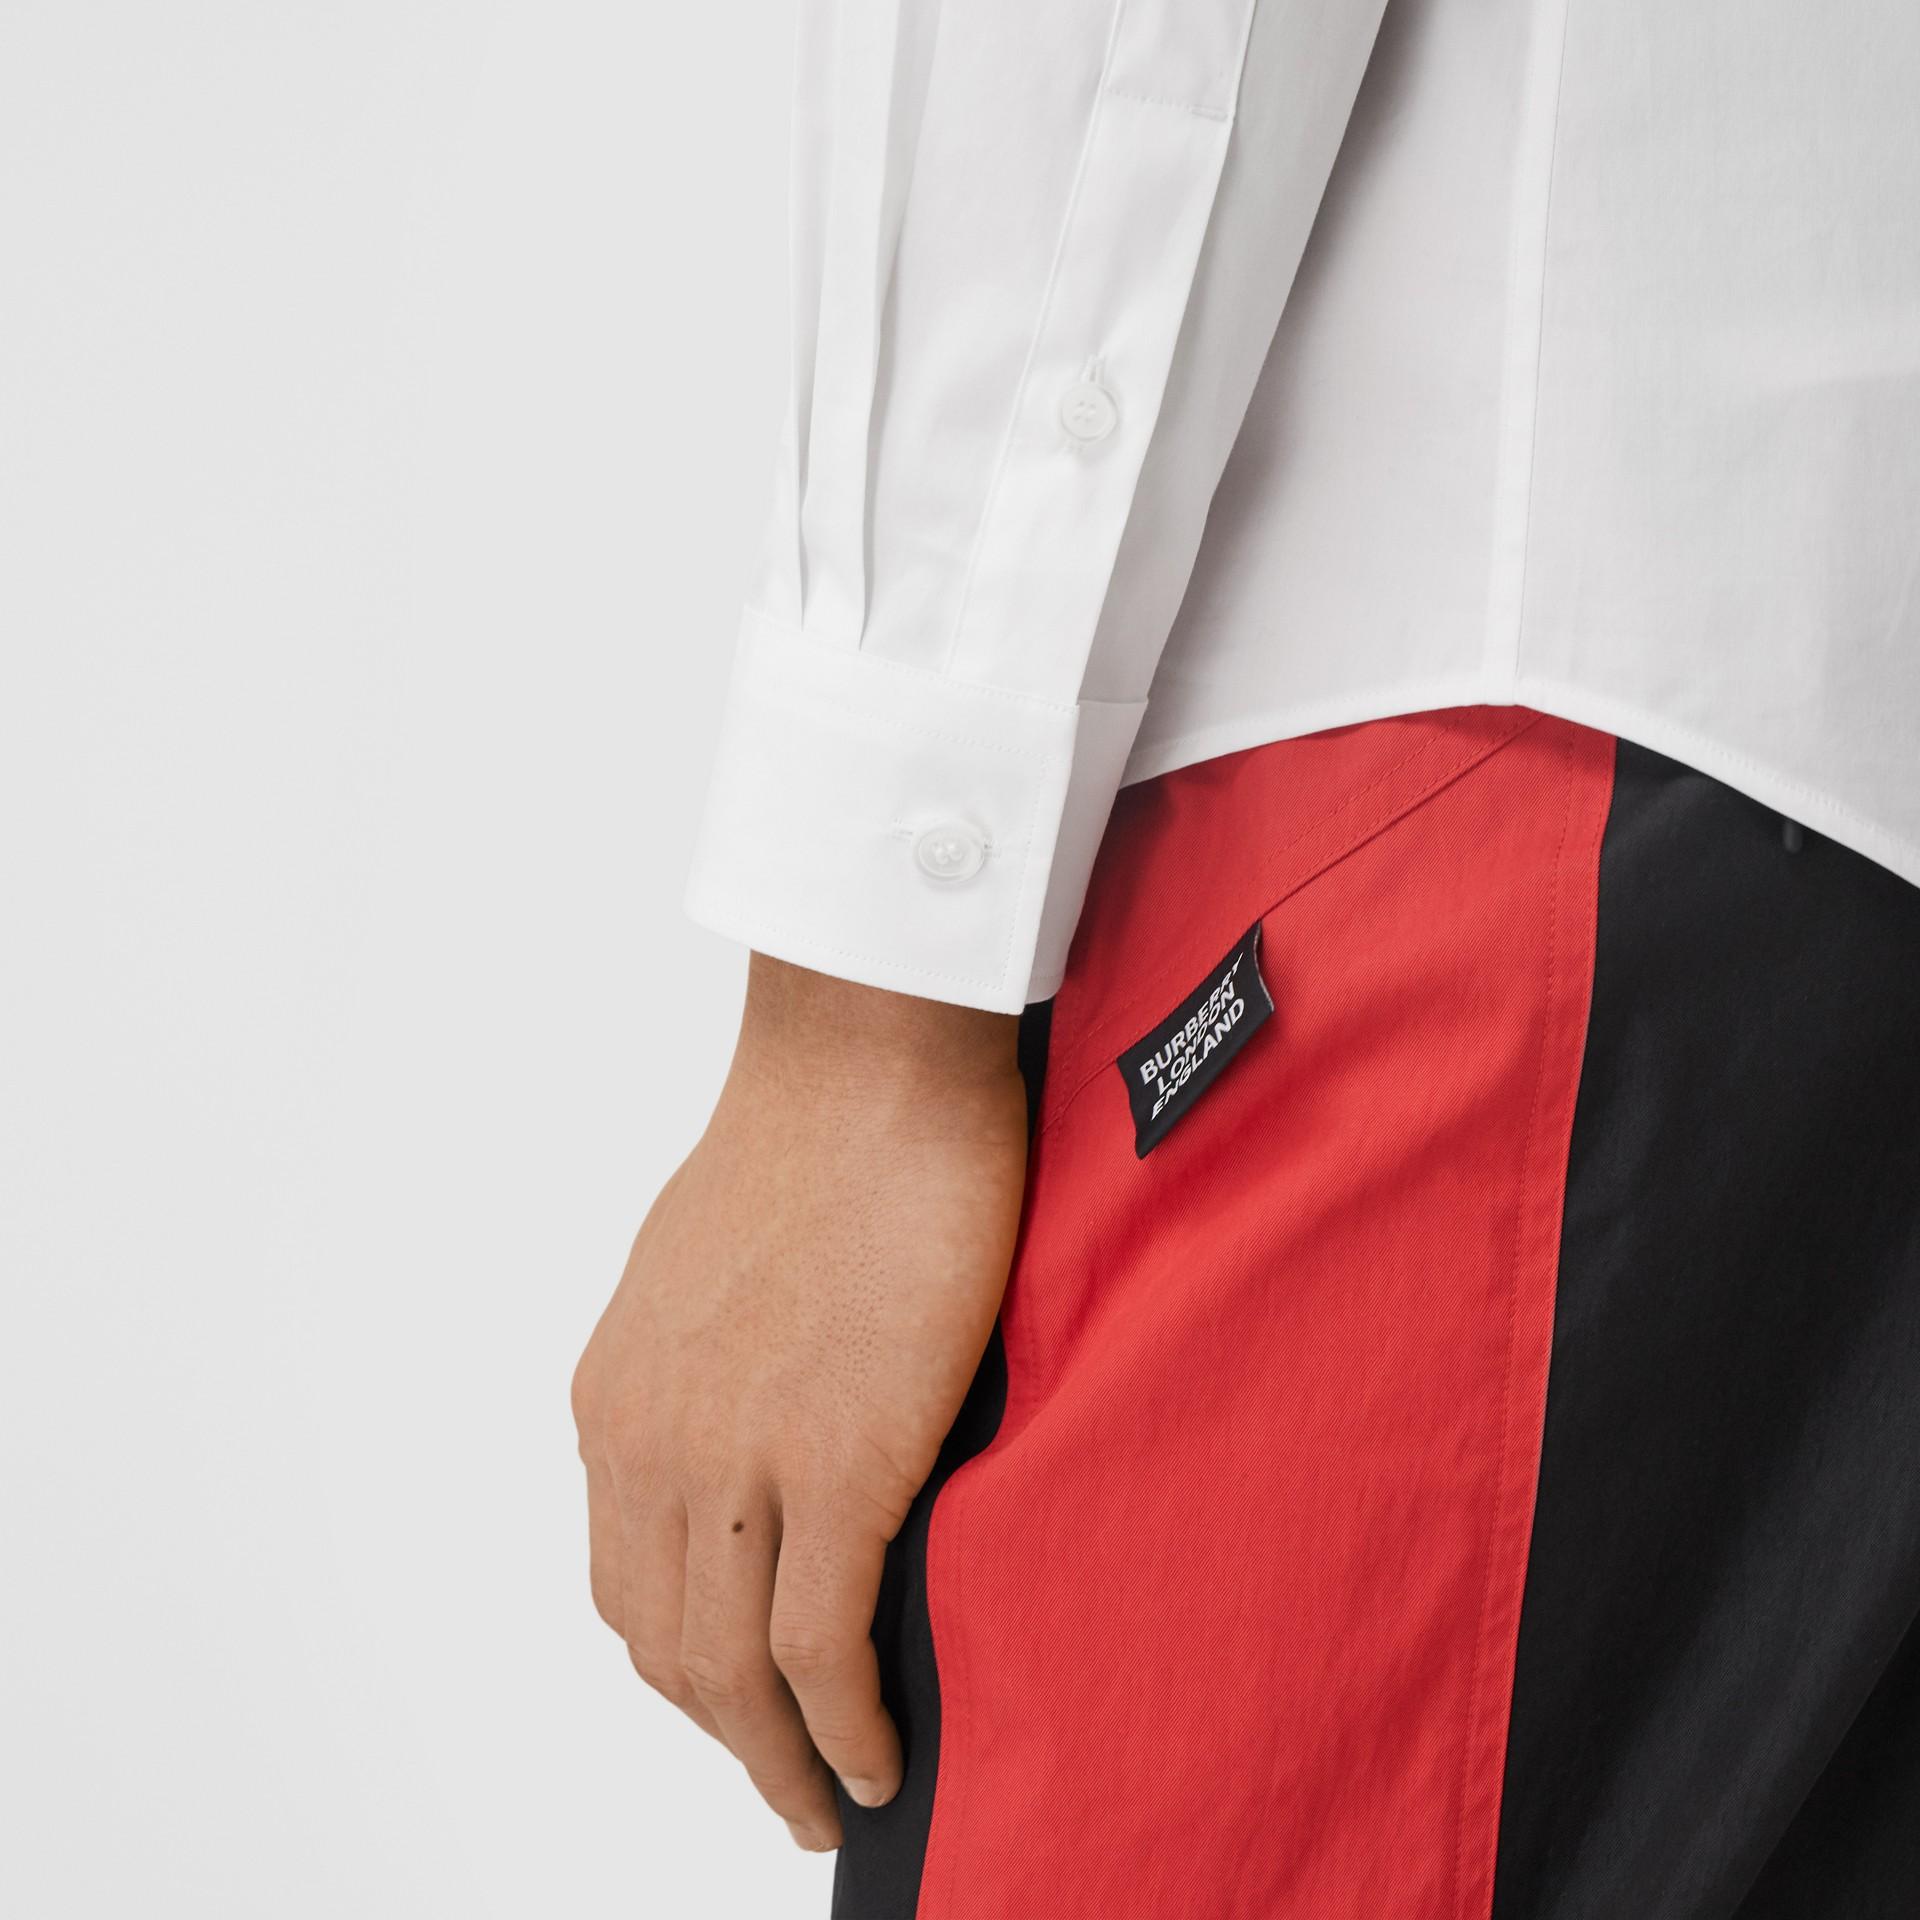 Slim Fit Monogram Motif Stretch Cotton Poplin Shirt in White - Men | Burberry United States - gallery image 1